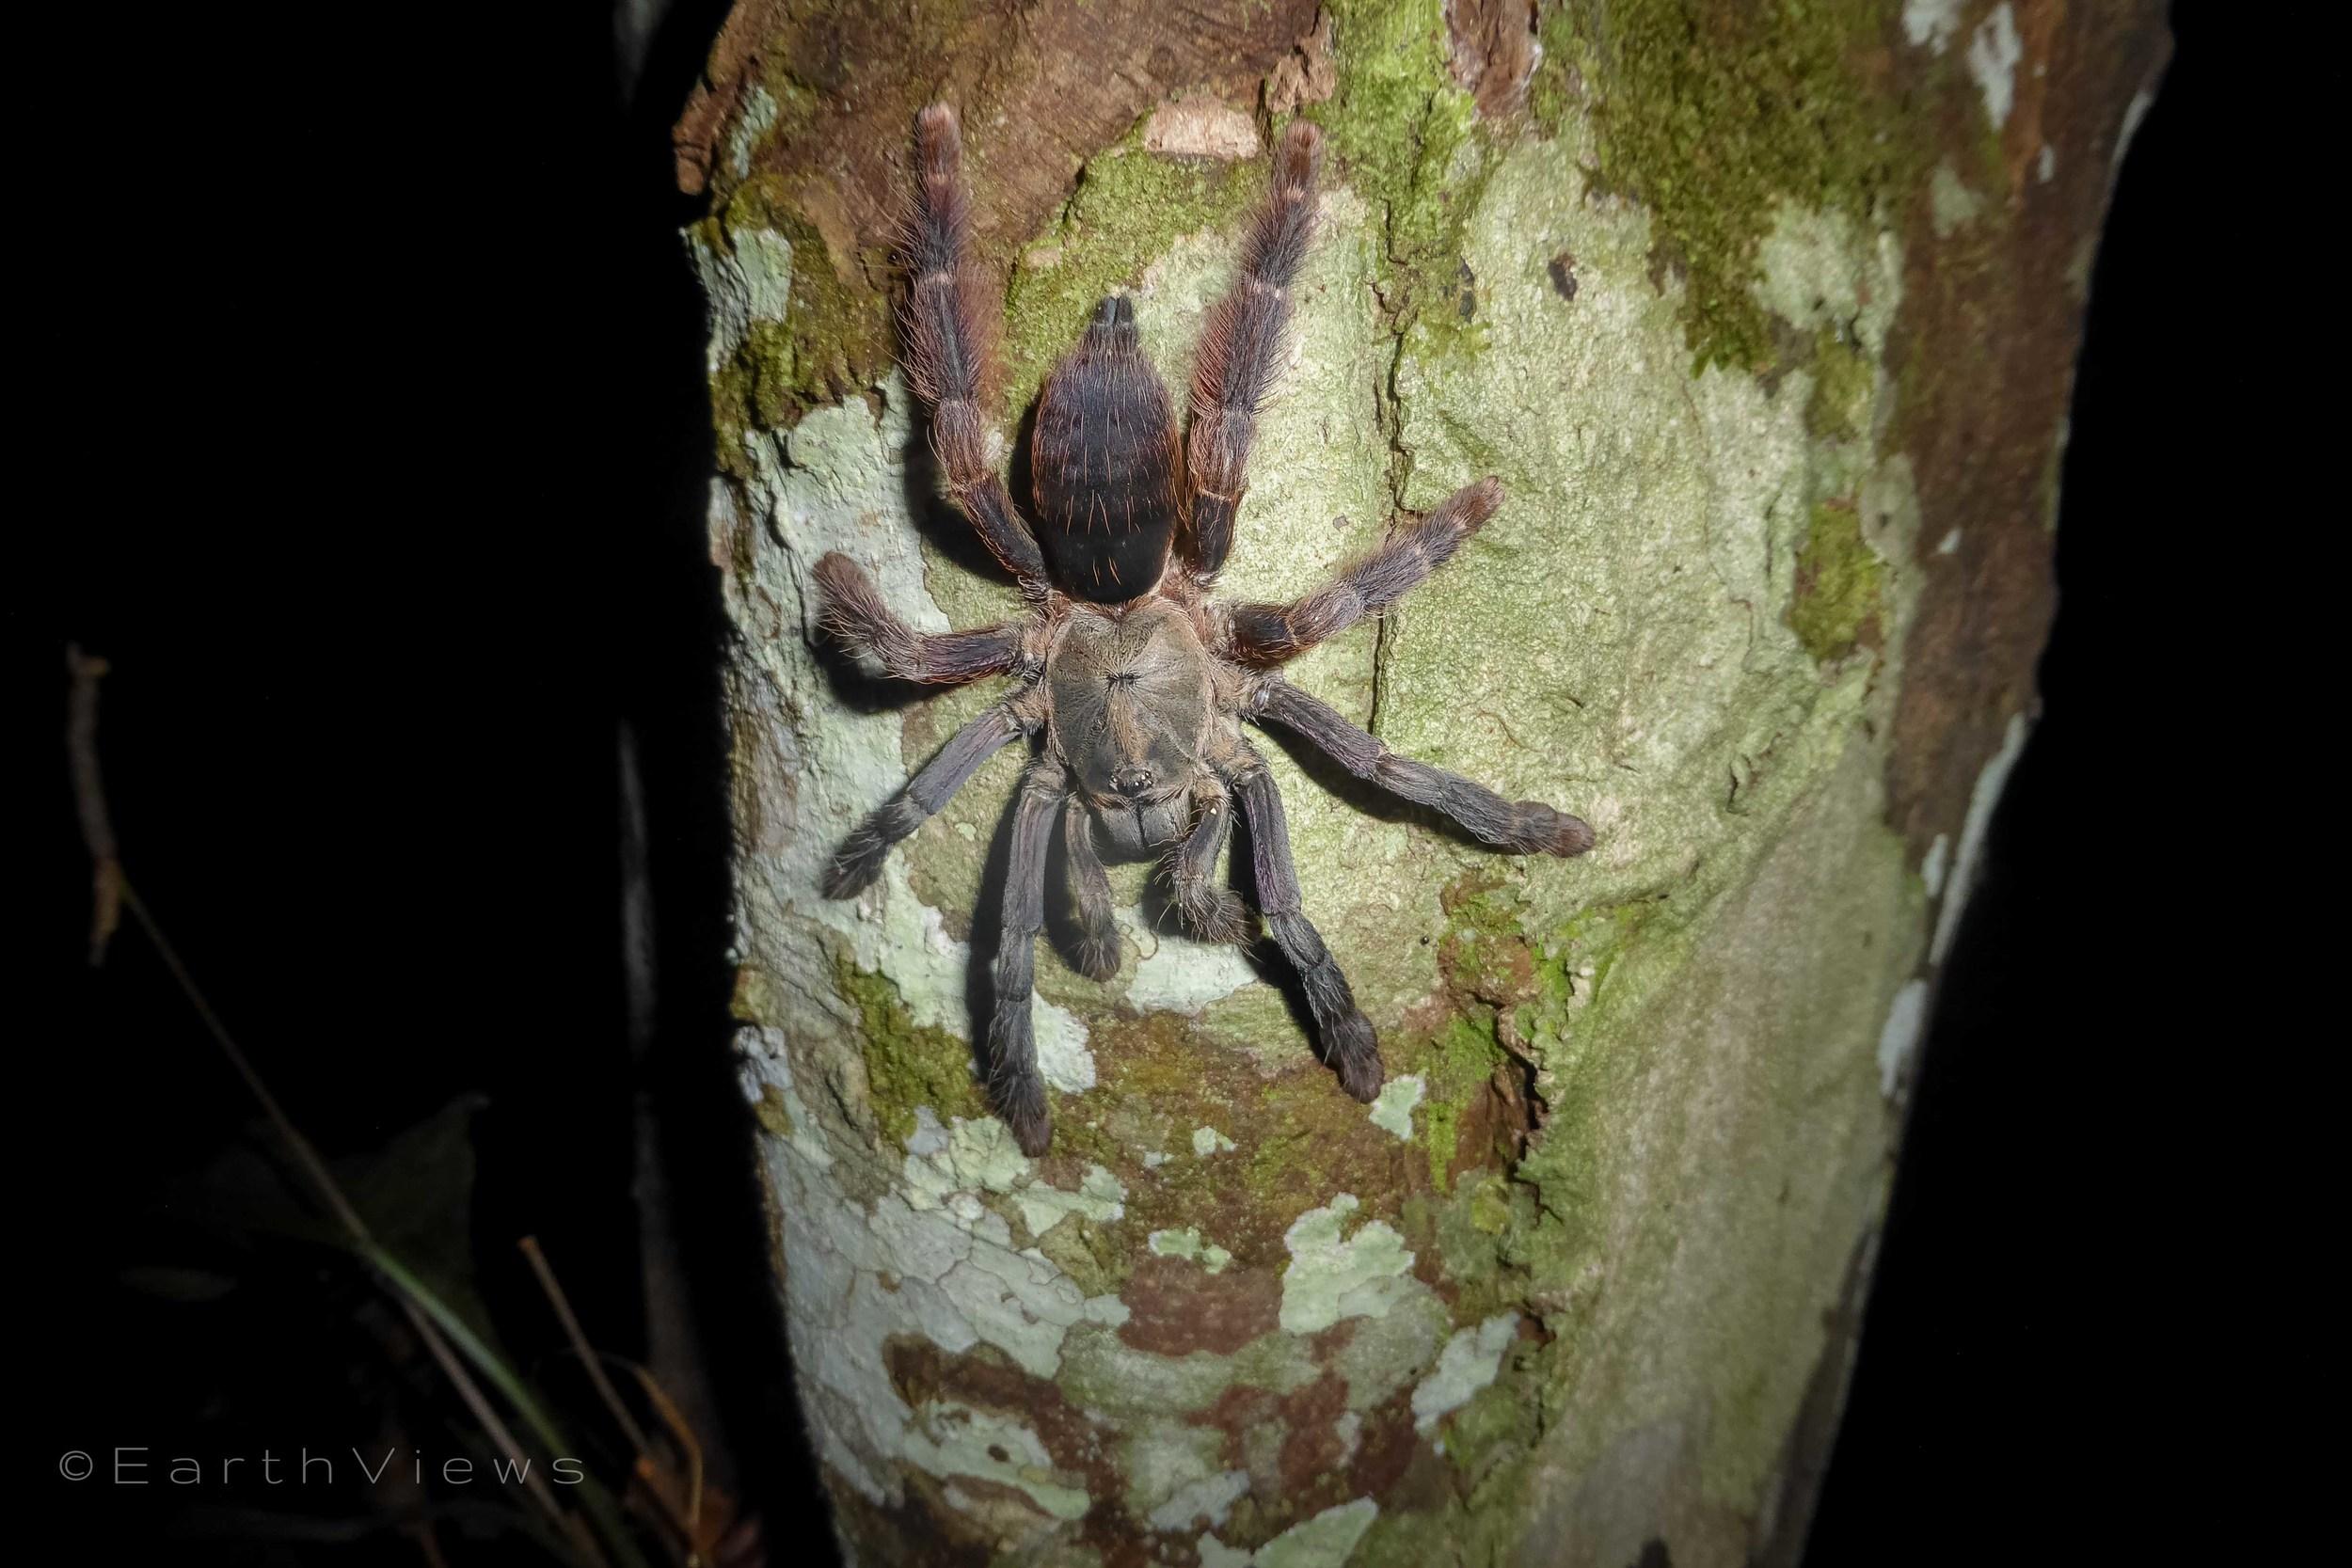 A 30-centimetre tarantula sitting on the tree next to the hut.